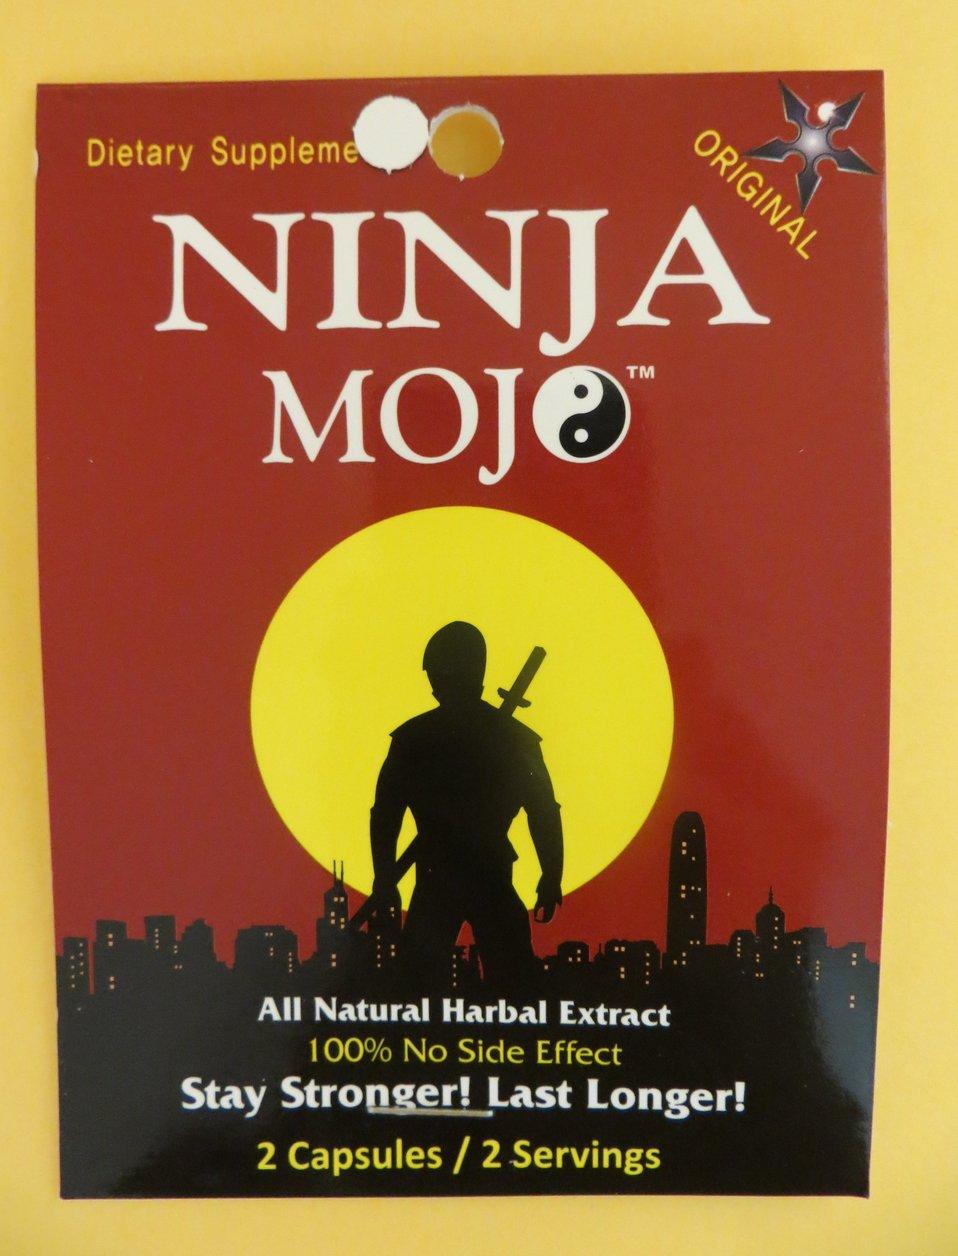 Ninja Mojo